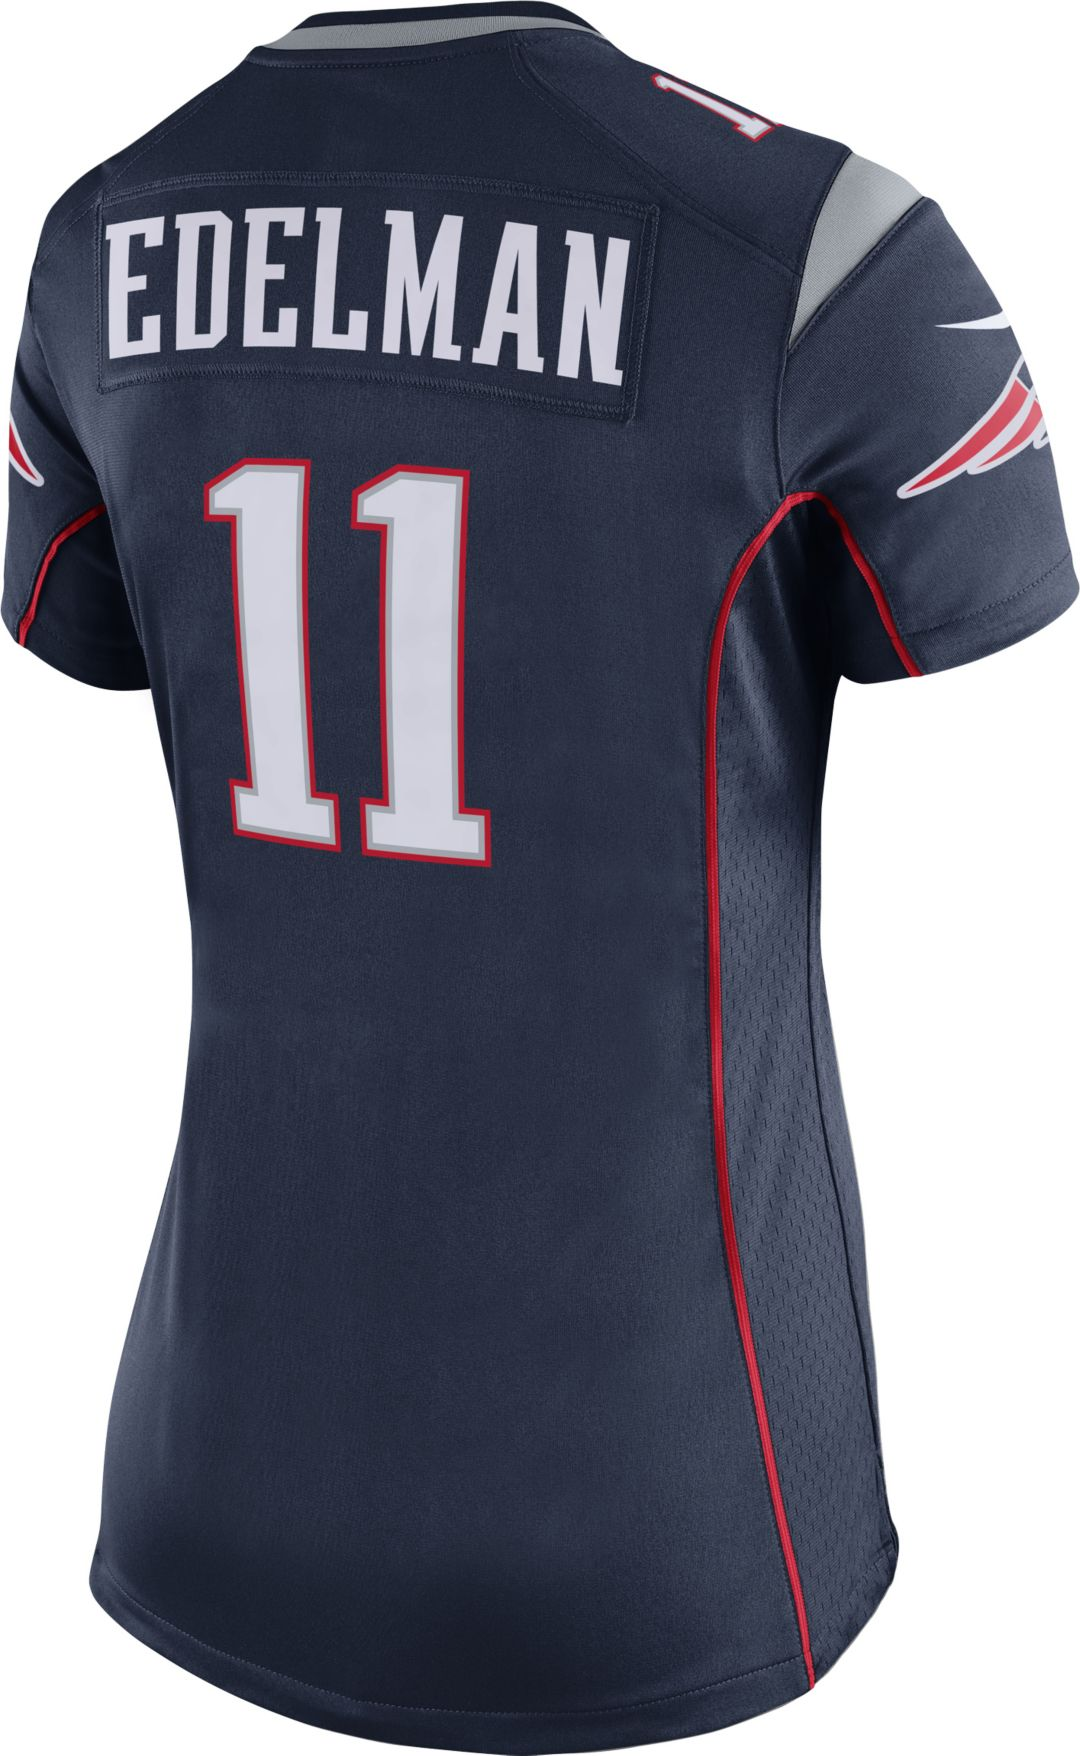 sale retailer eda87 227d6 Nike Women's Home Game Jersey New England Patriots Julian Edelman #11